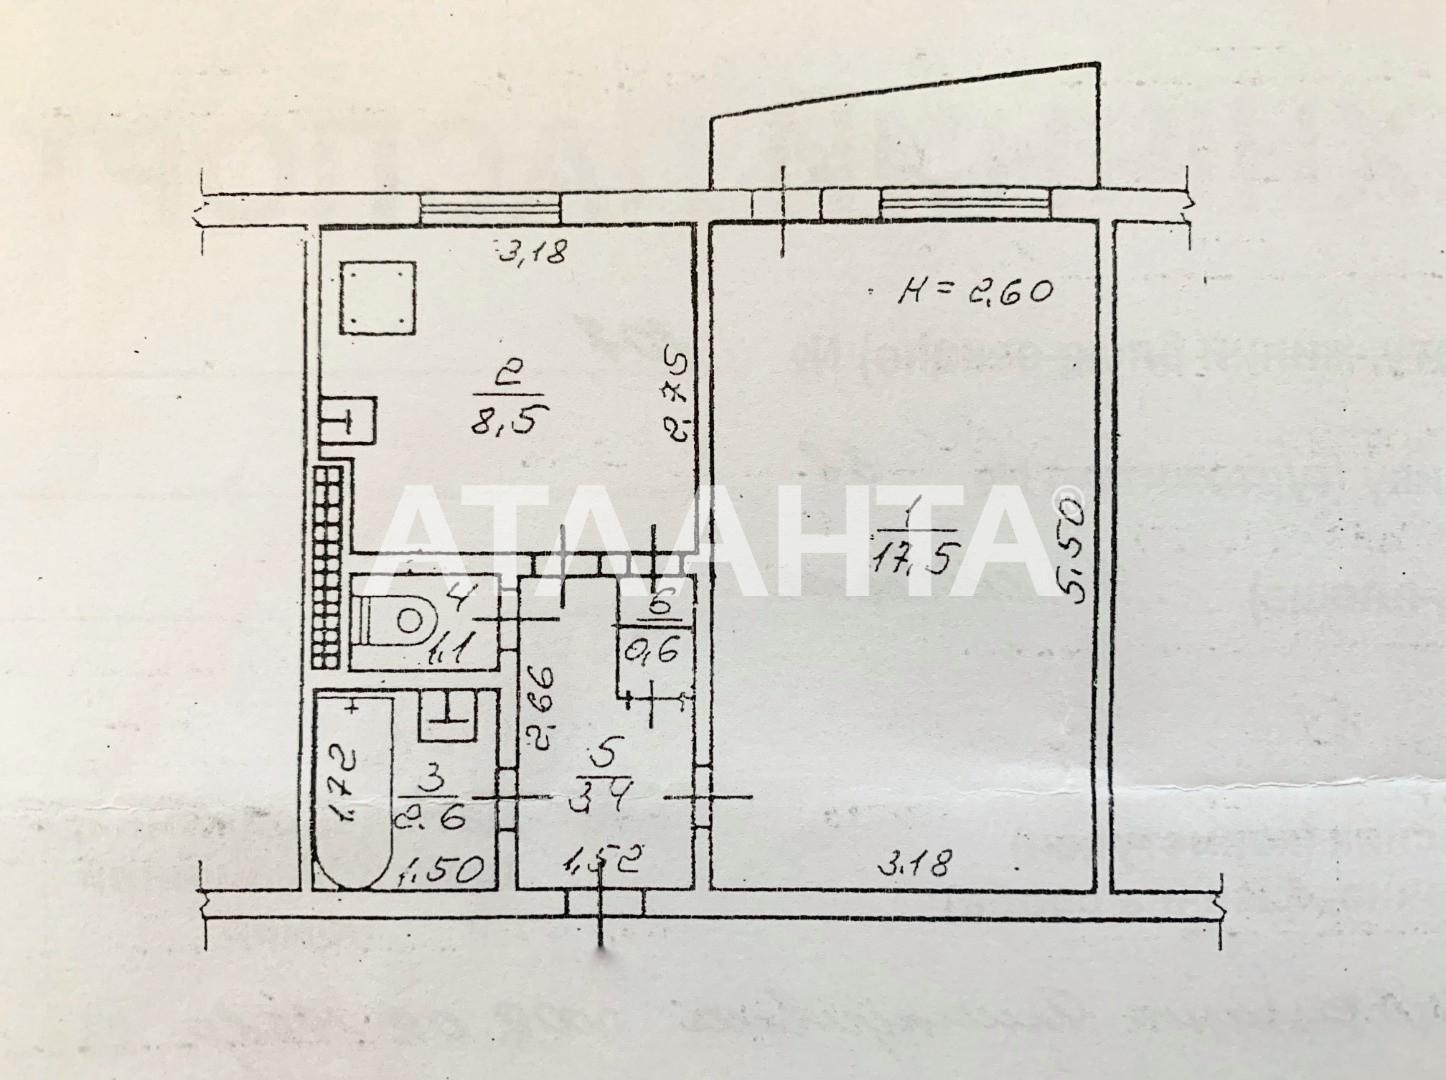 Продается 1-комнатная Квартира на ул. Балковская (Фрунзе) — 30 000 у.е. (фото №18)